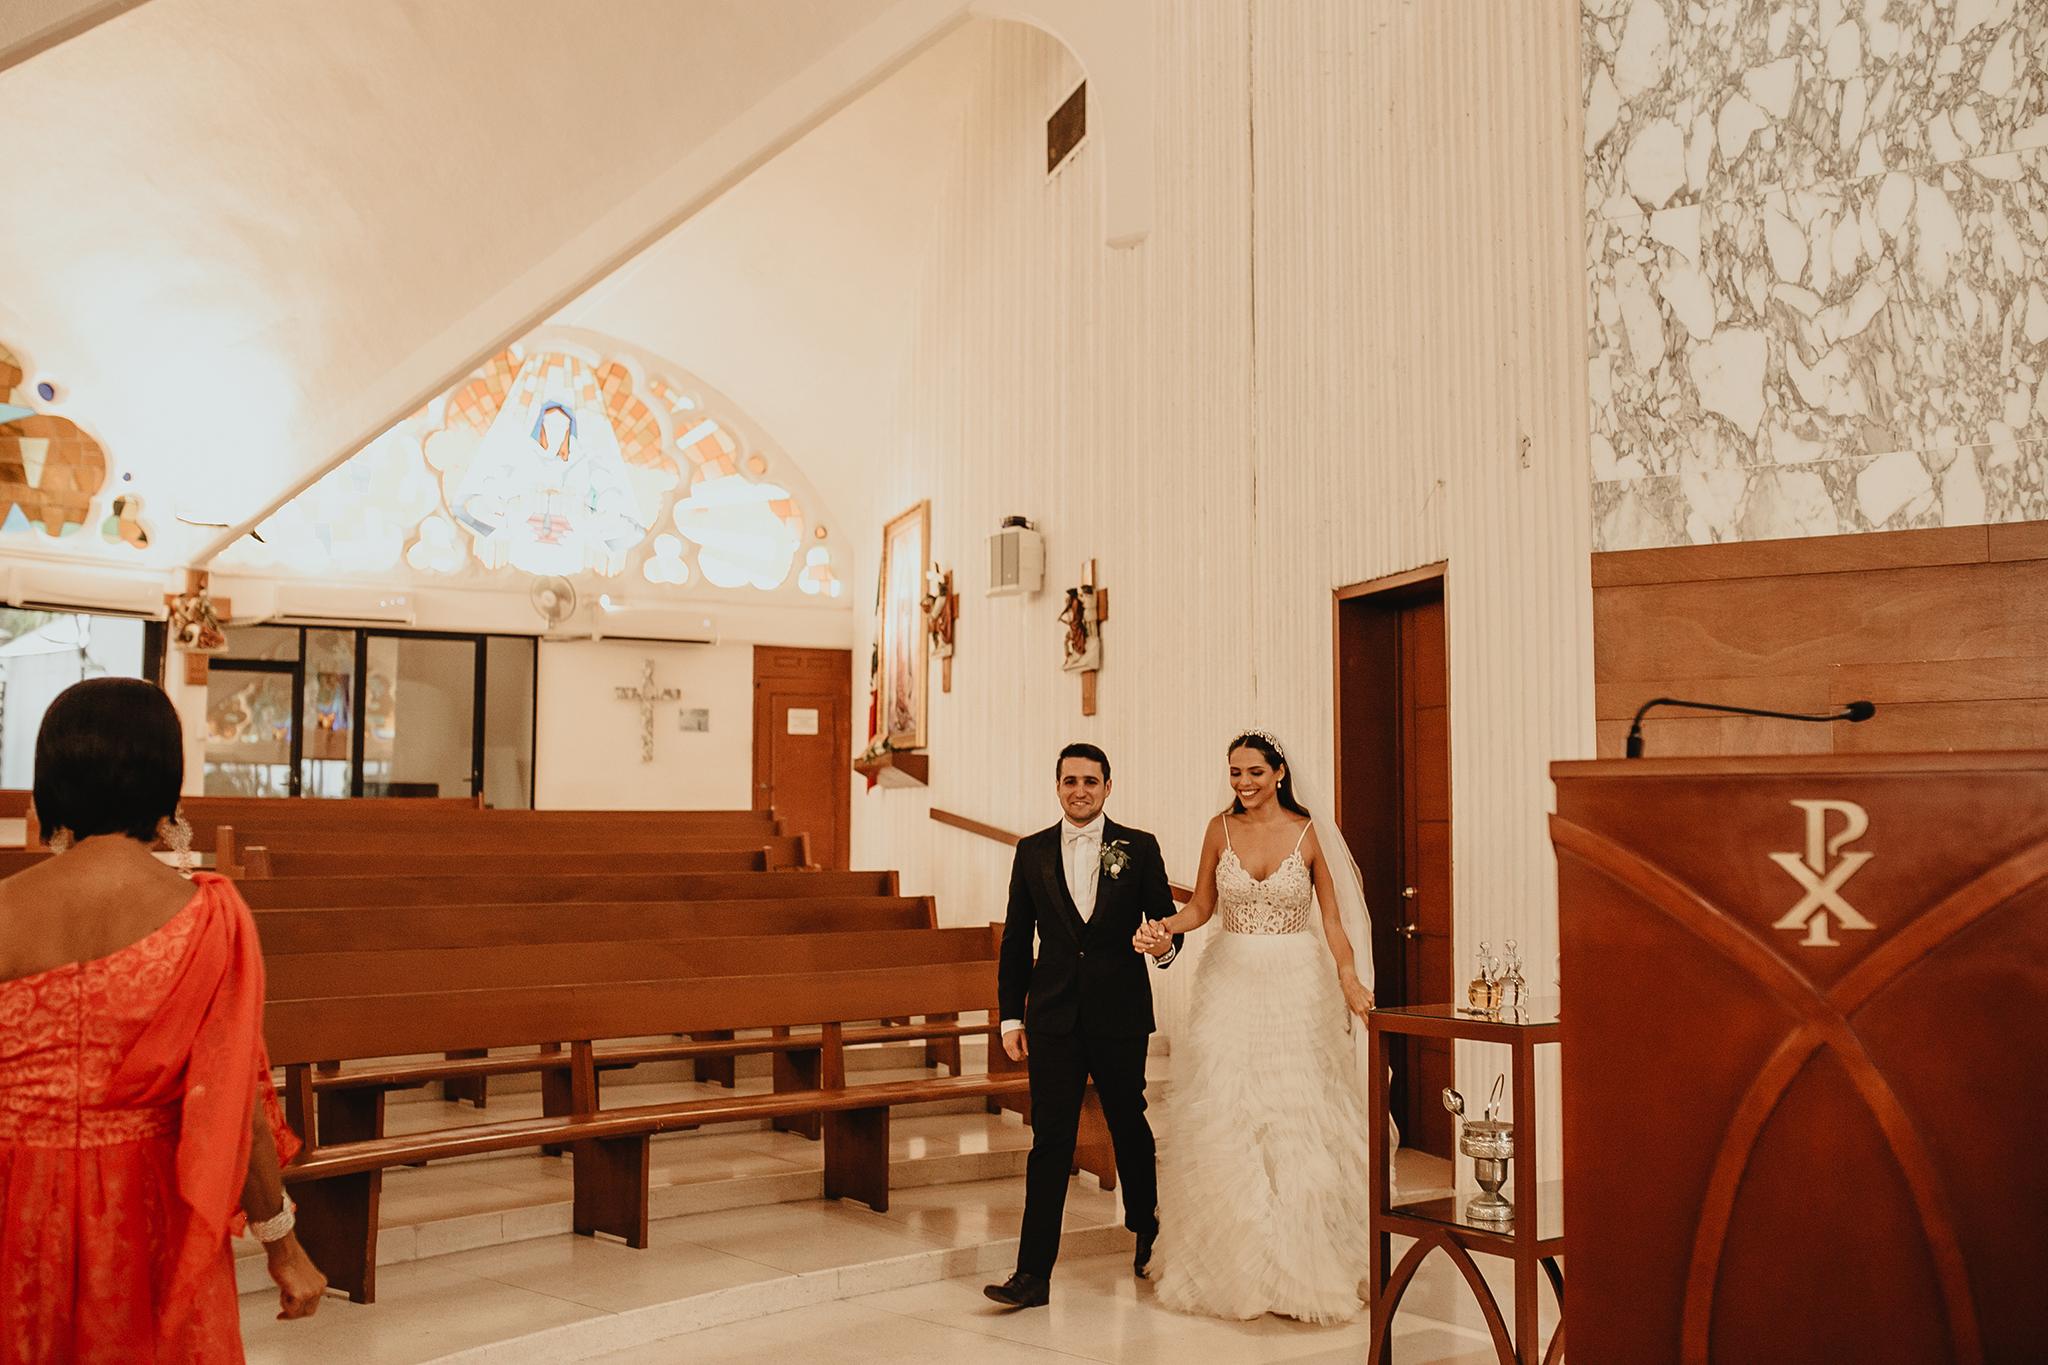 0779R&F__WeddingDestination_Weddingmerida_BodaMexico_FotografoDeBodas_FabrizioSimoneenFotografo.jpg